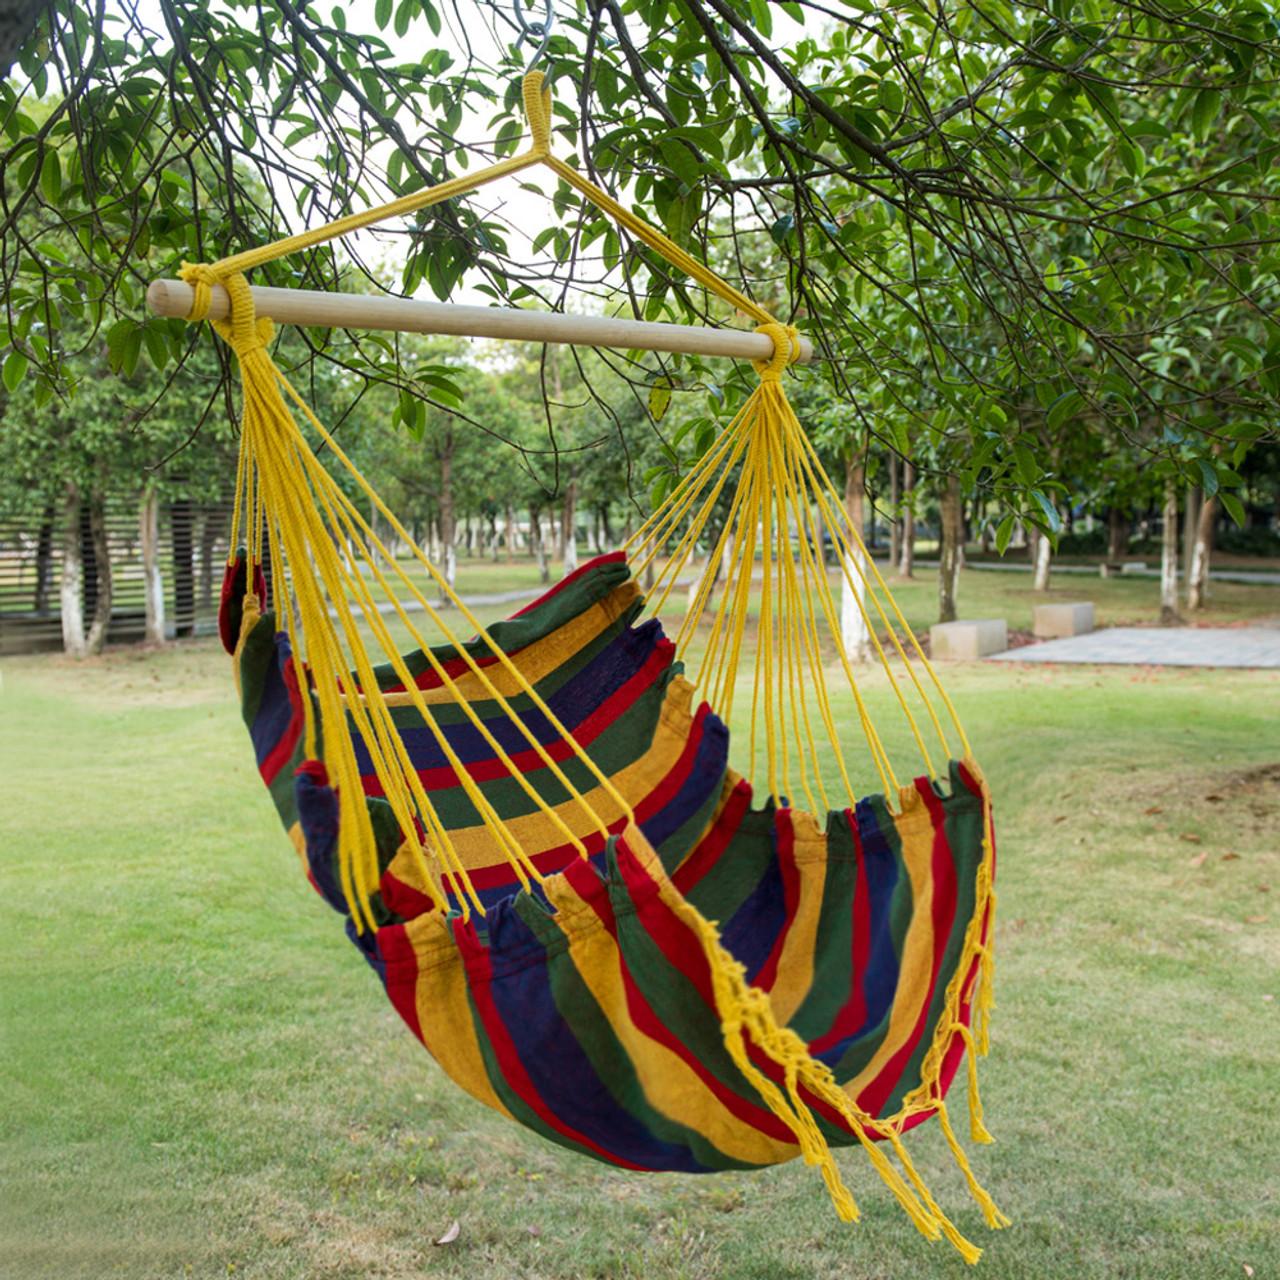 Lazy daze hammocks canvas hanging hammock swing chair seat with wood spreader bar tropical stripe